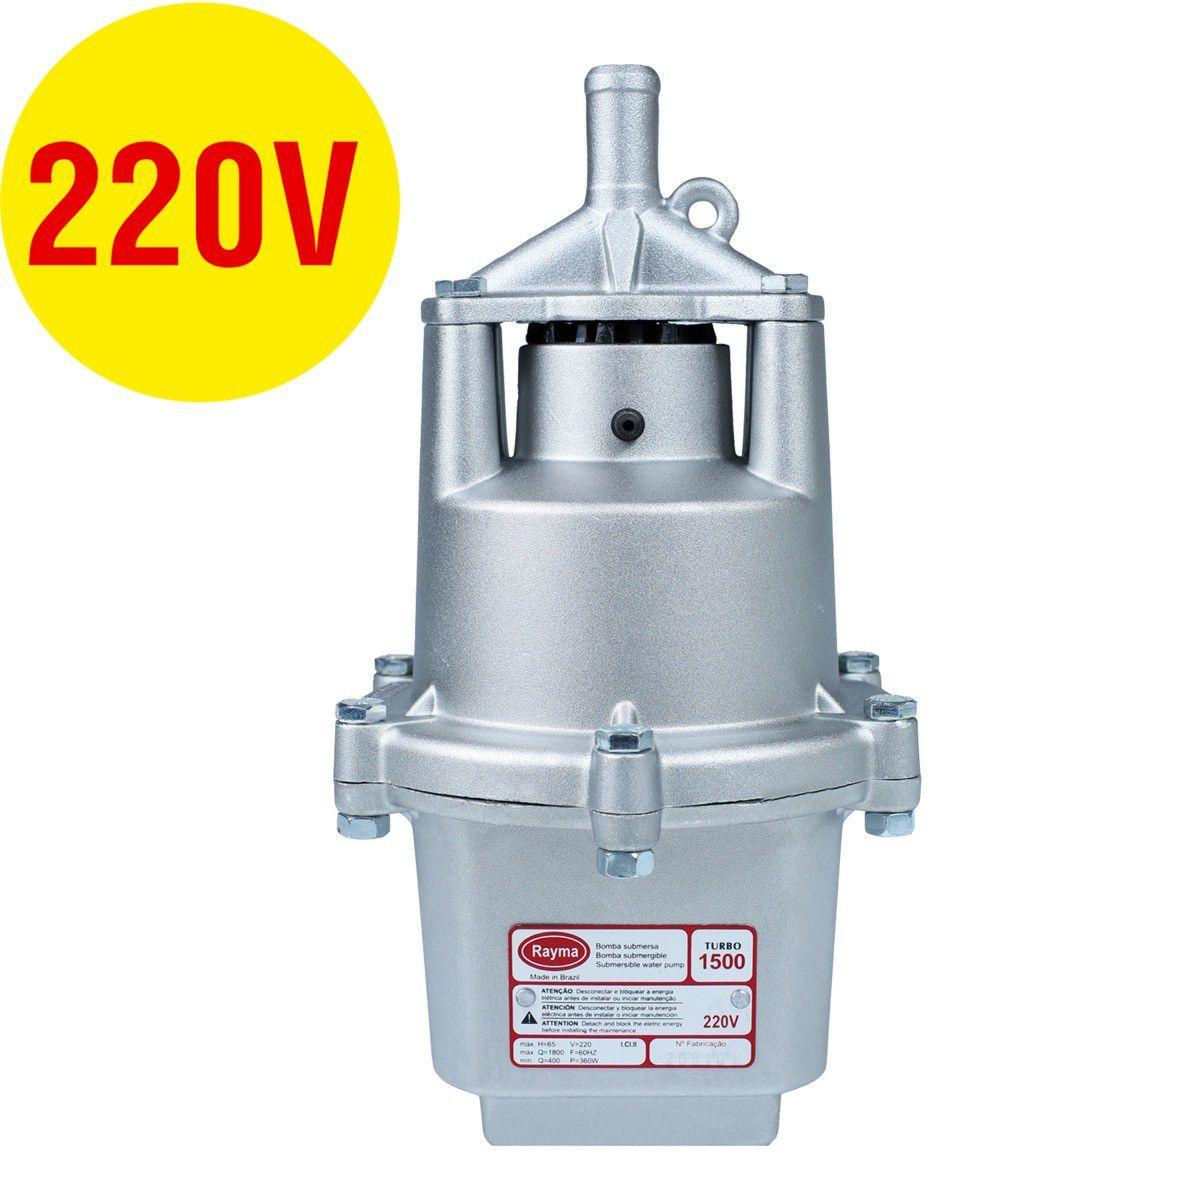 Bomba Submersa Rayma Turbo 1500 70Mt 220V